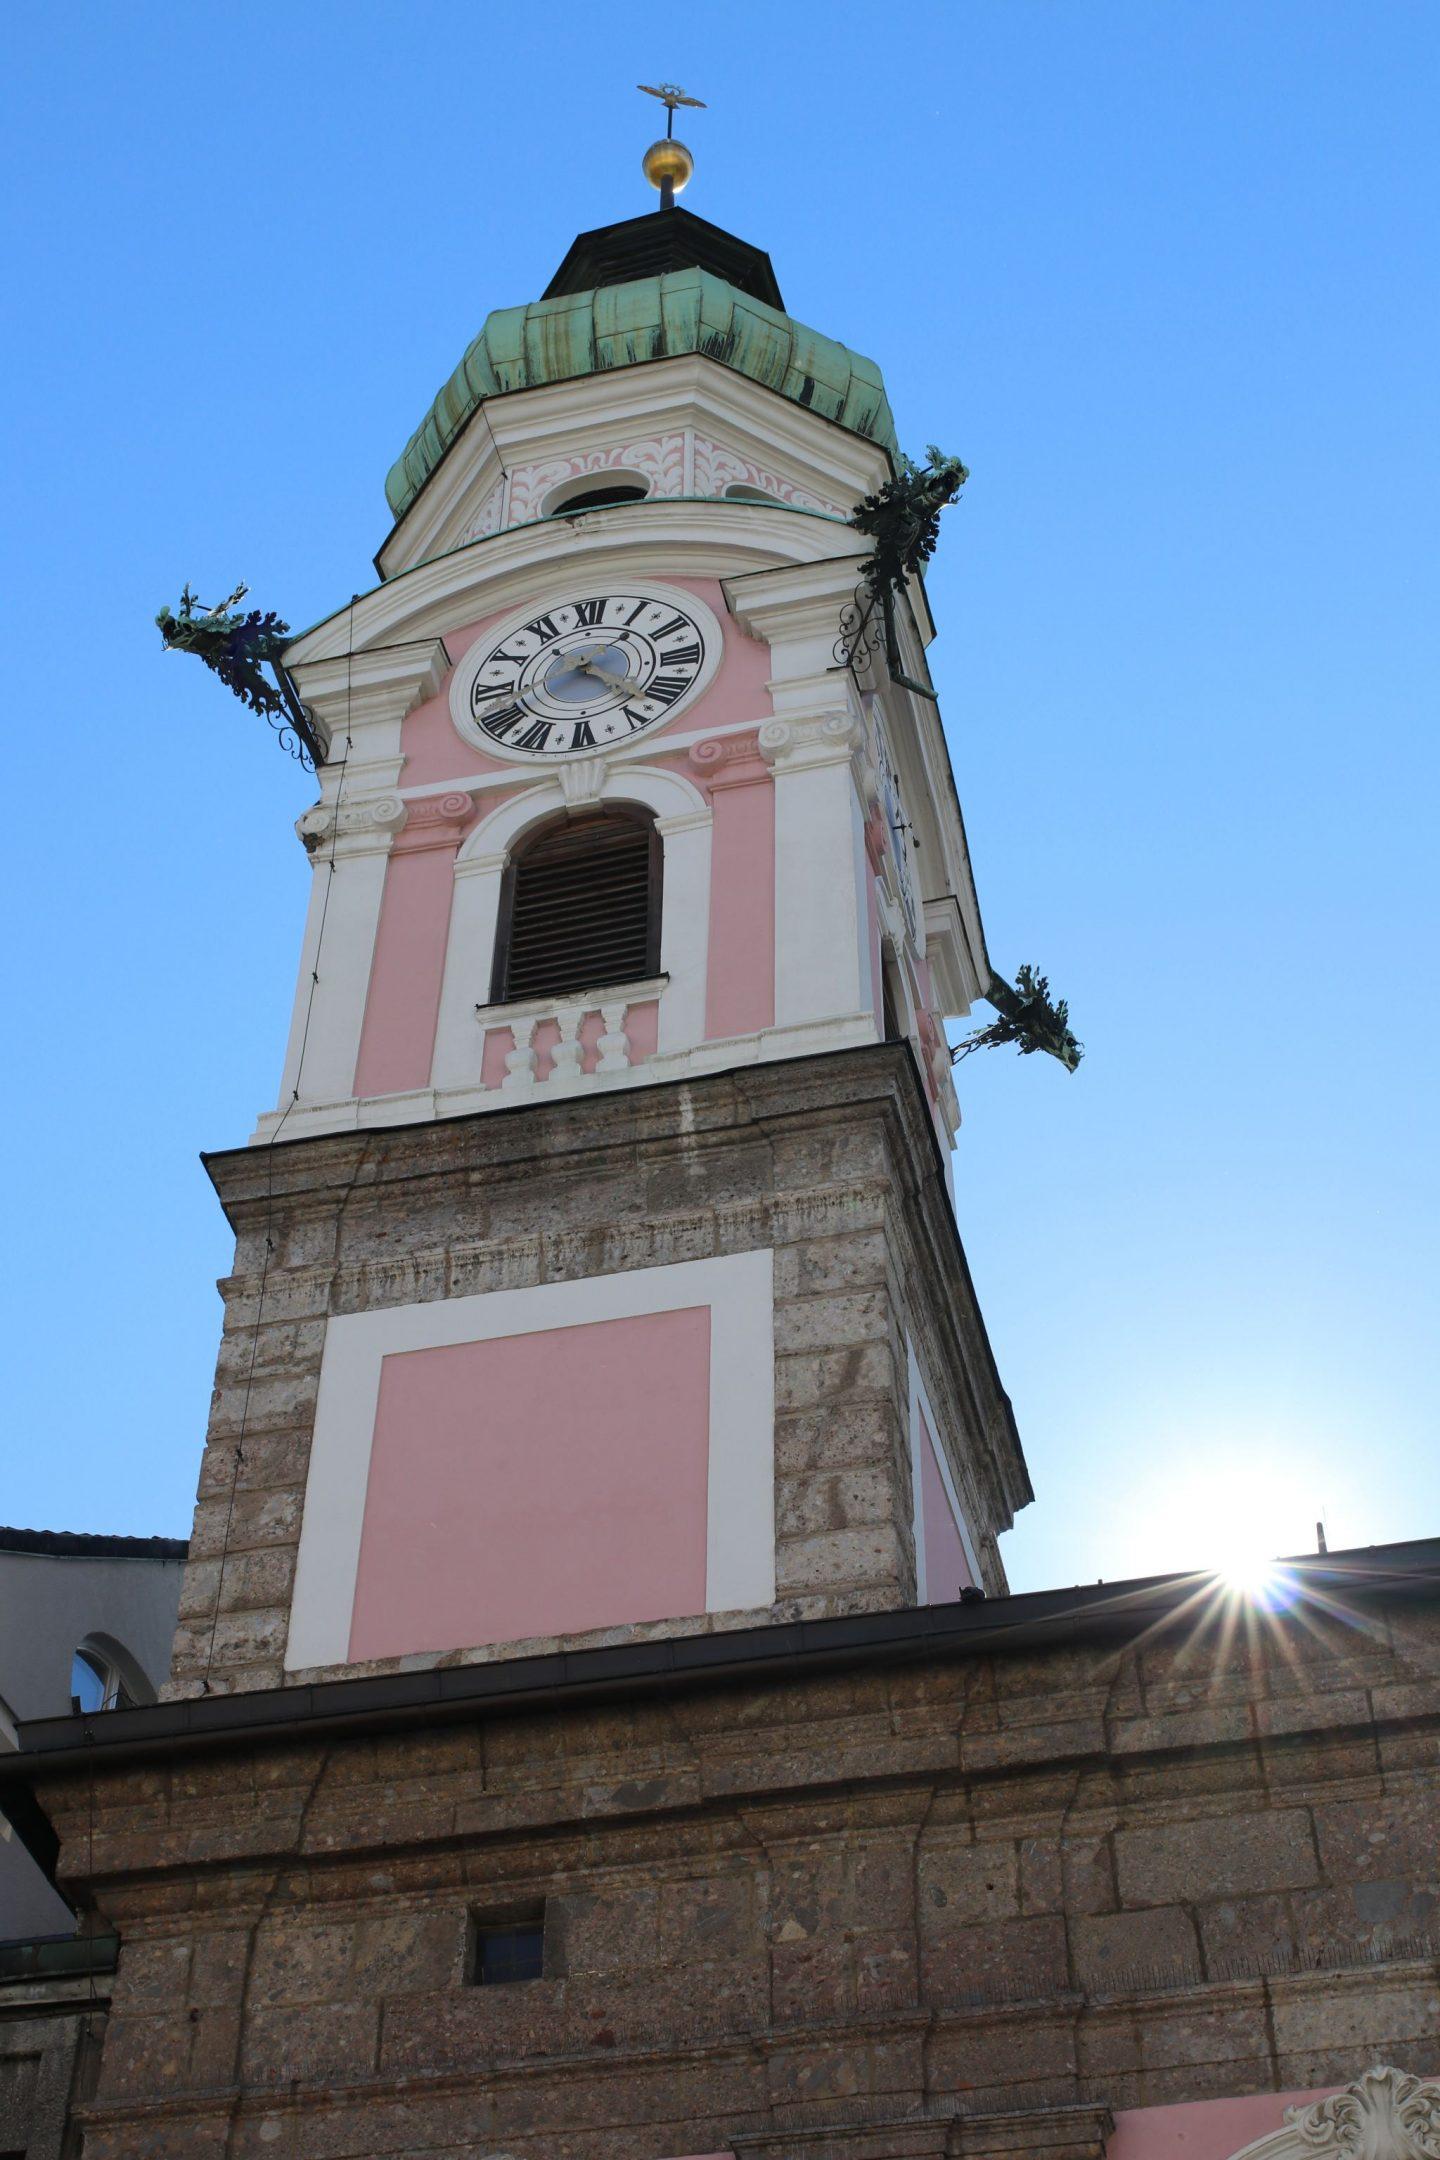 Katie Heath, KALANCHOE in Innsbruck. Austria, Uncover Austria